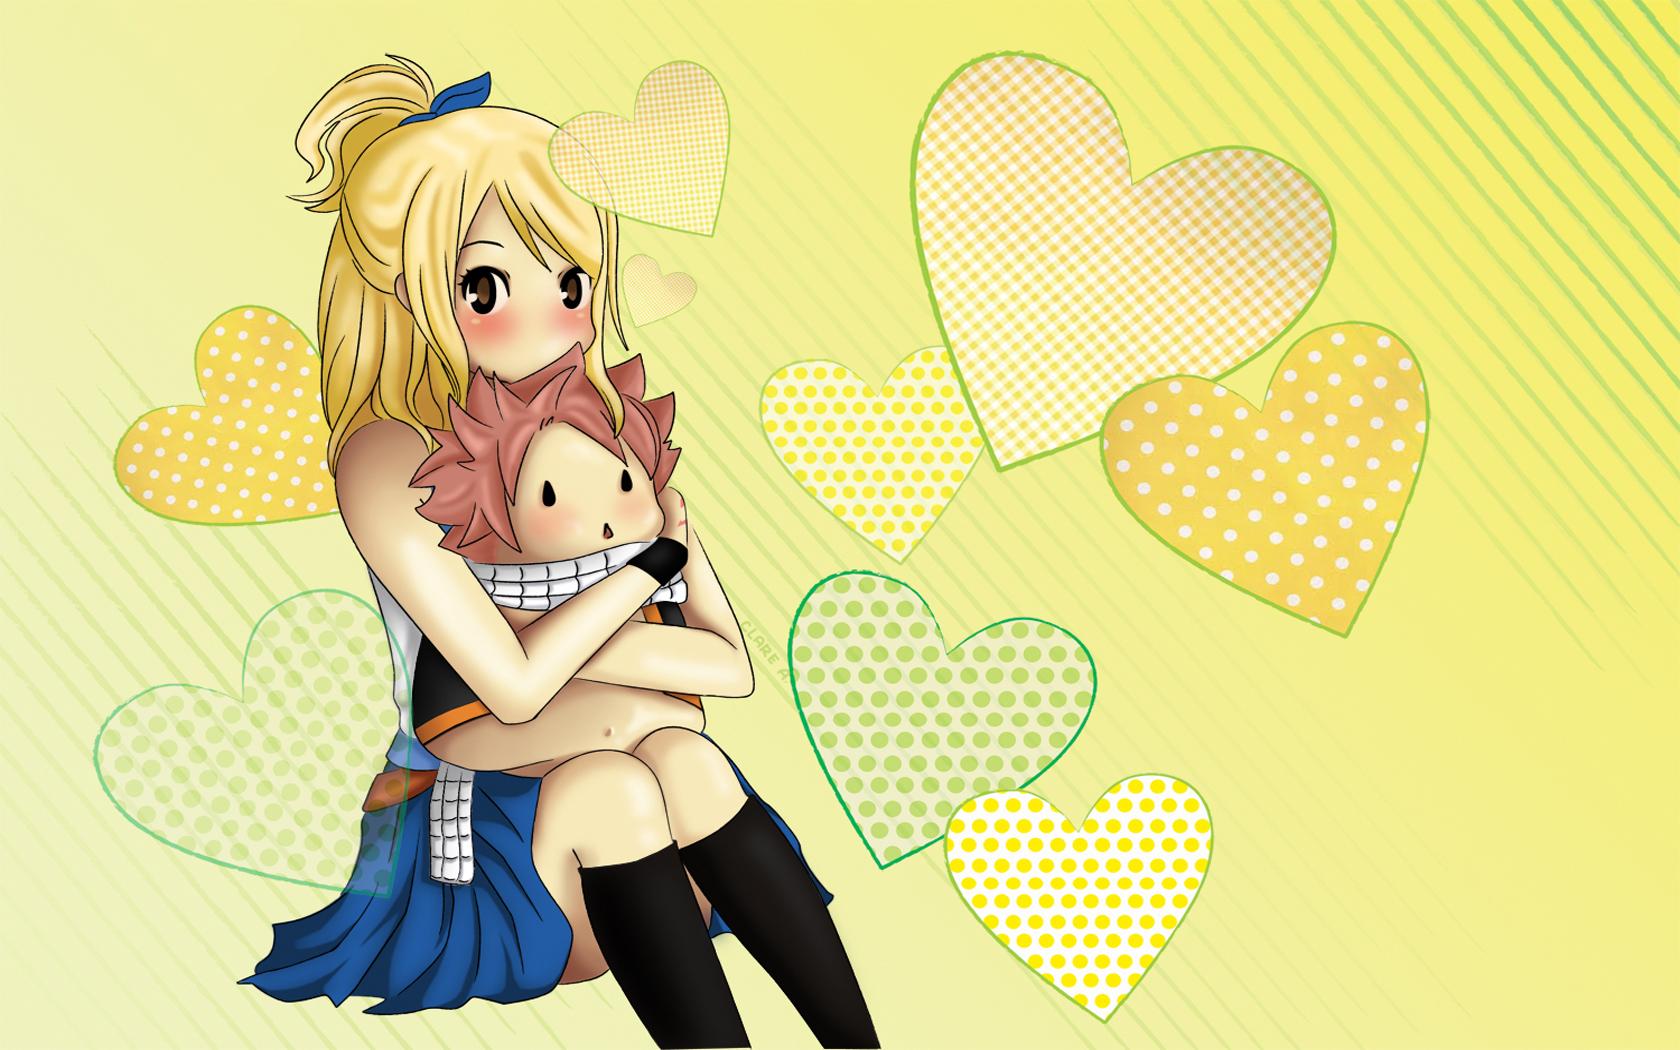 Lucy and Natsu 3m Wallpaper HD 1680x1050